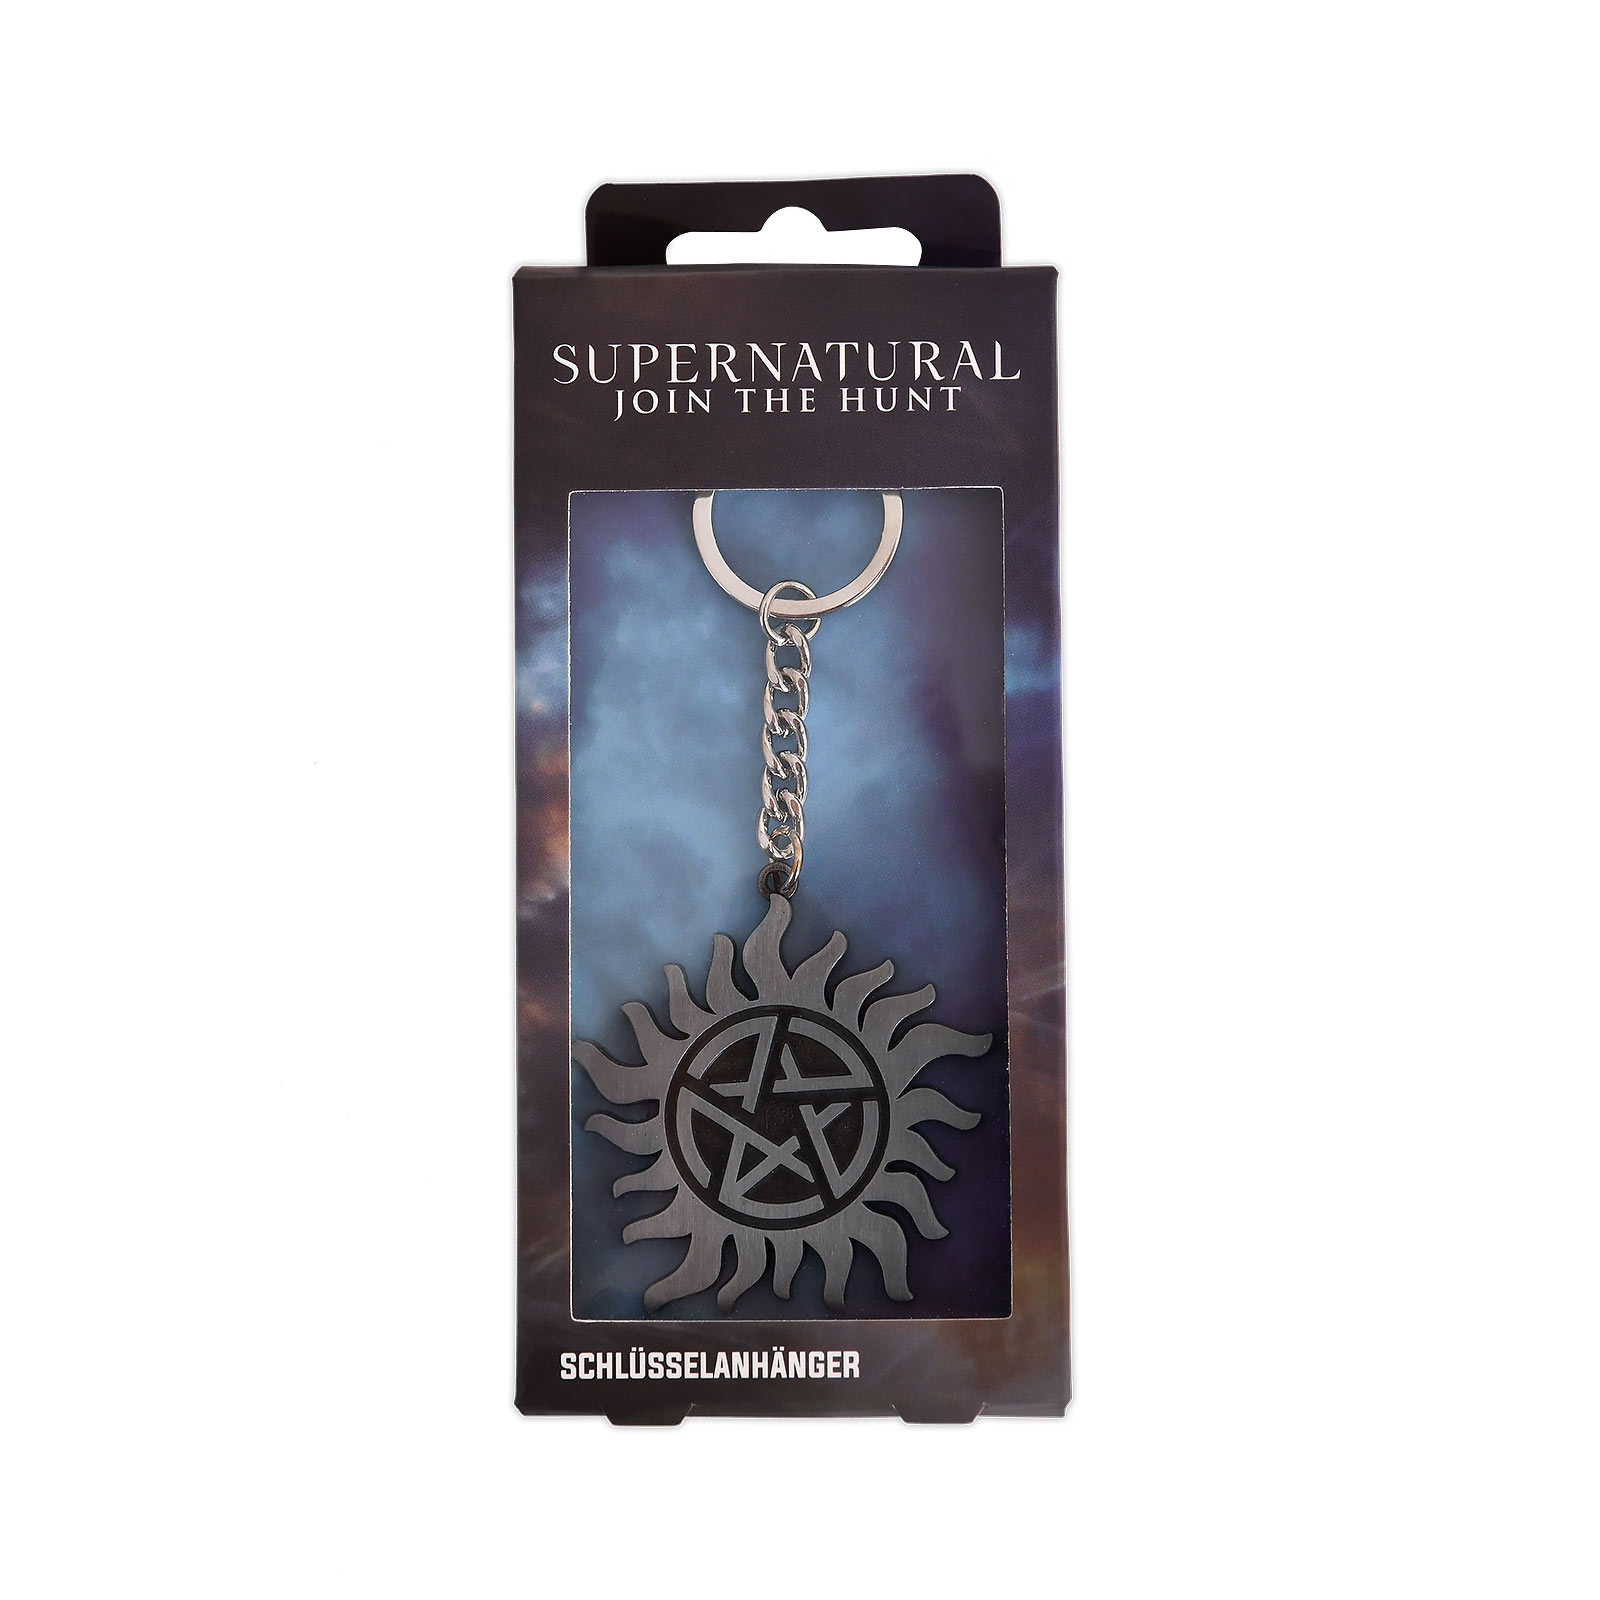 Supernatural - Anti Possession Schlüsselanhänger